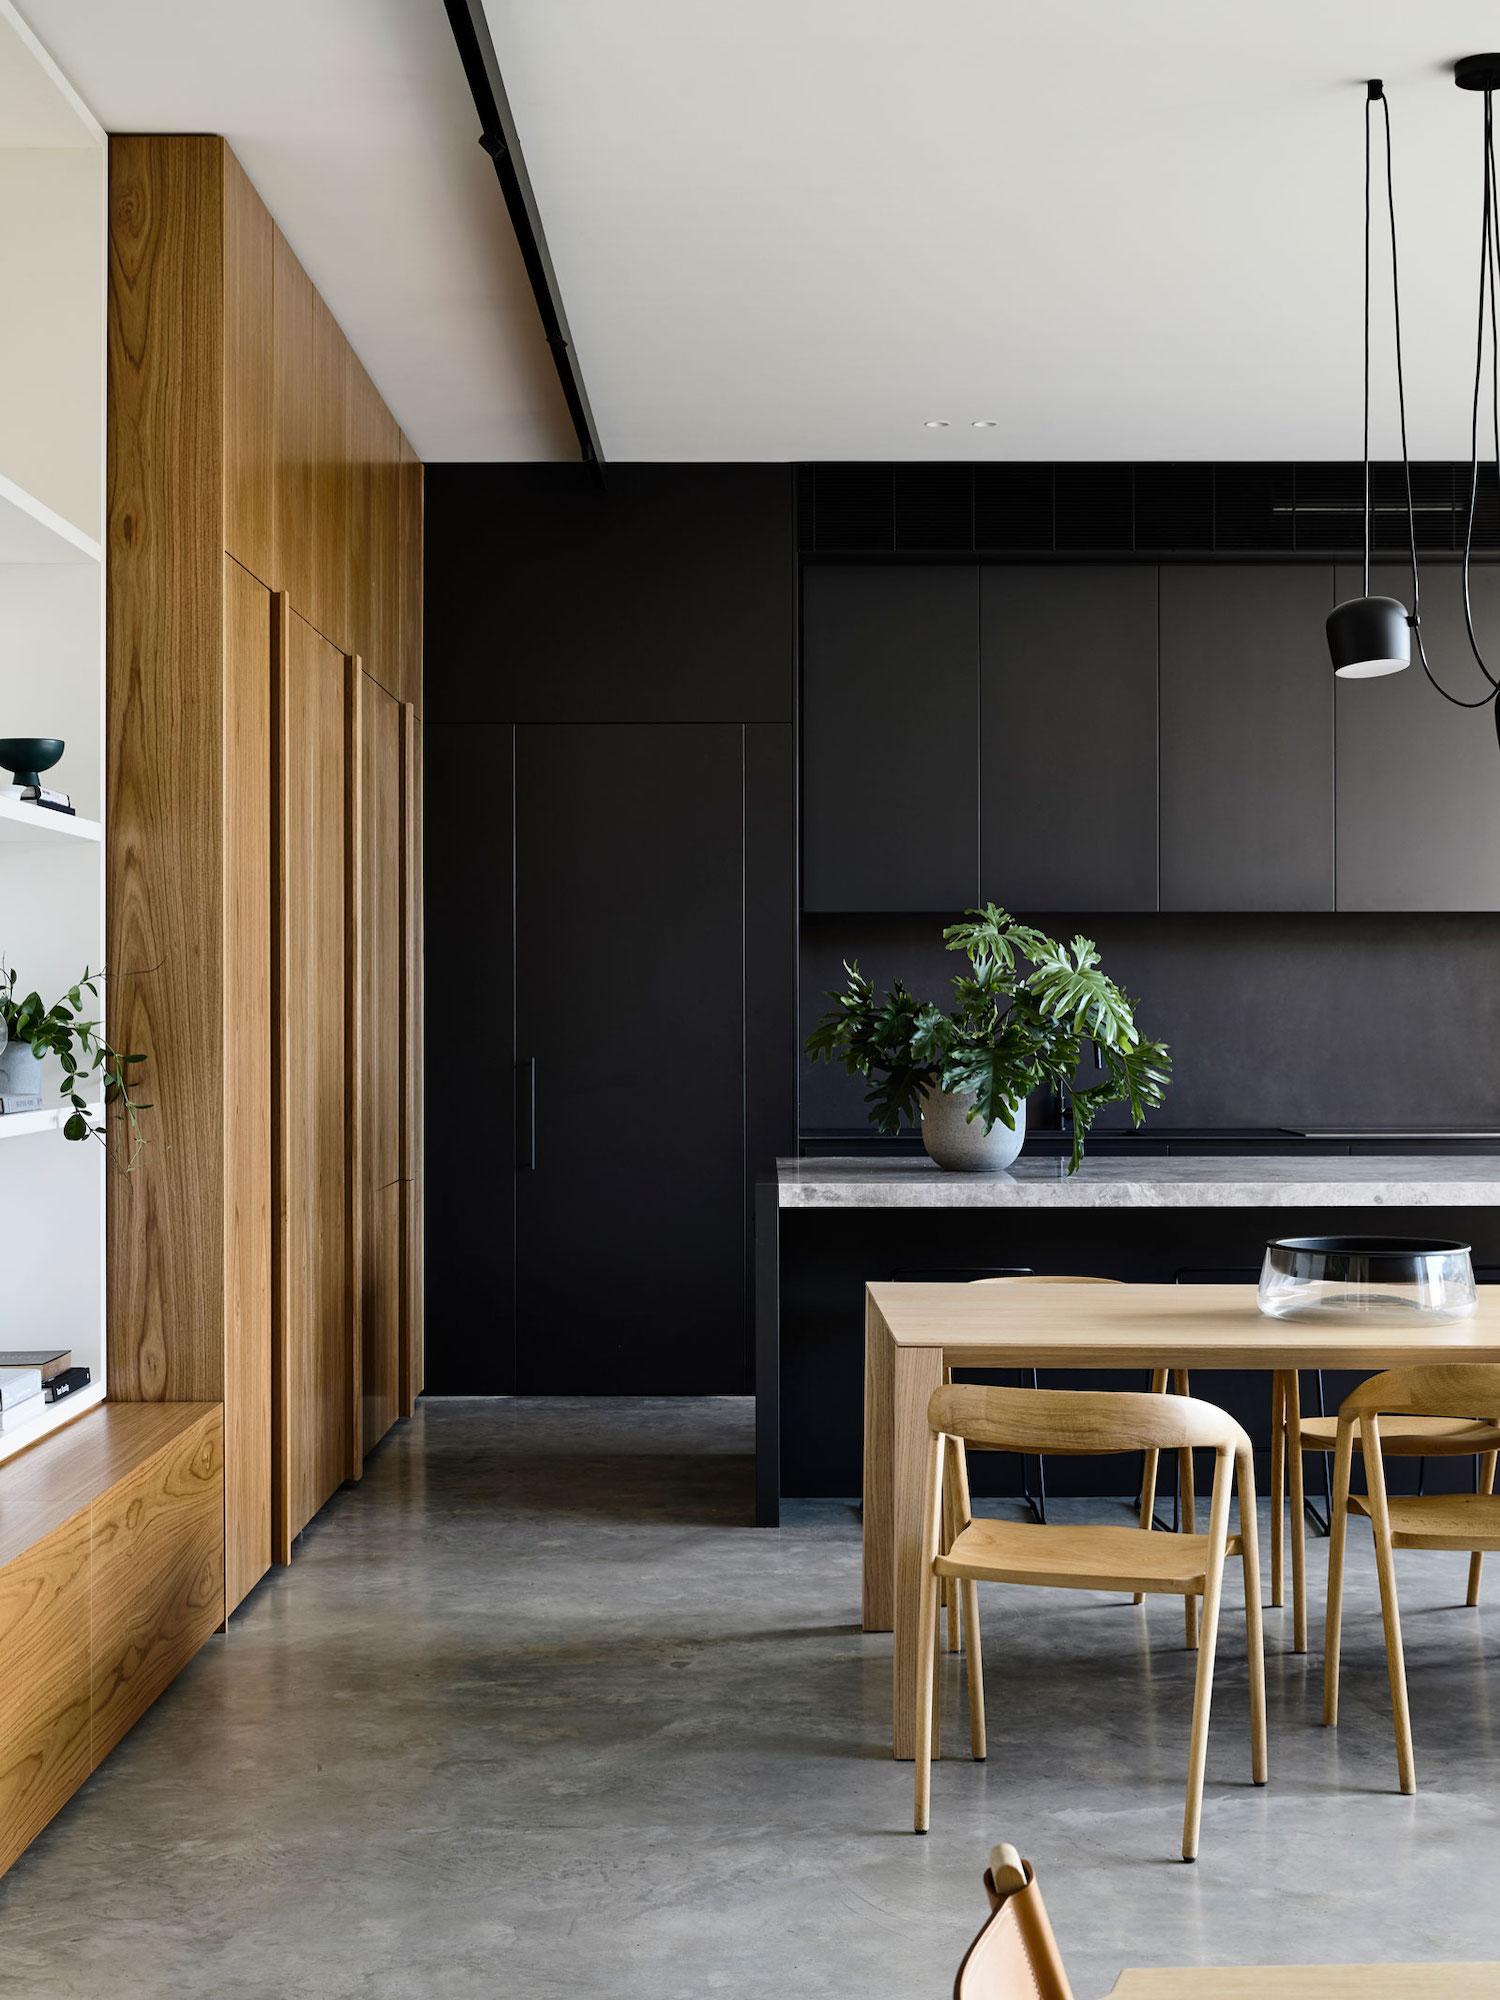 est living wellard architects malvern east 17